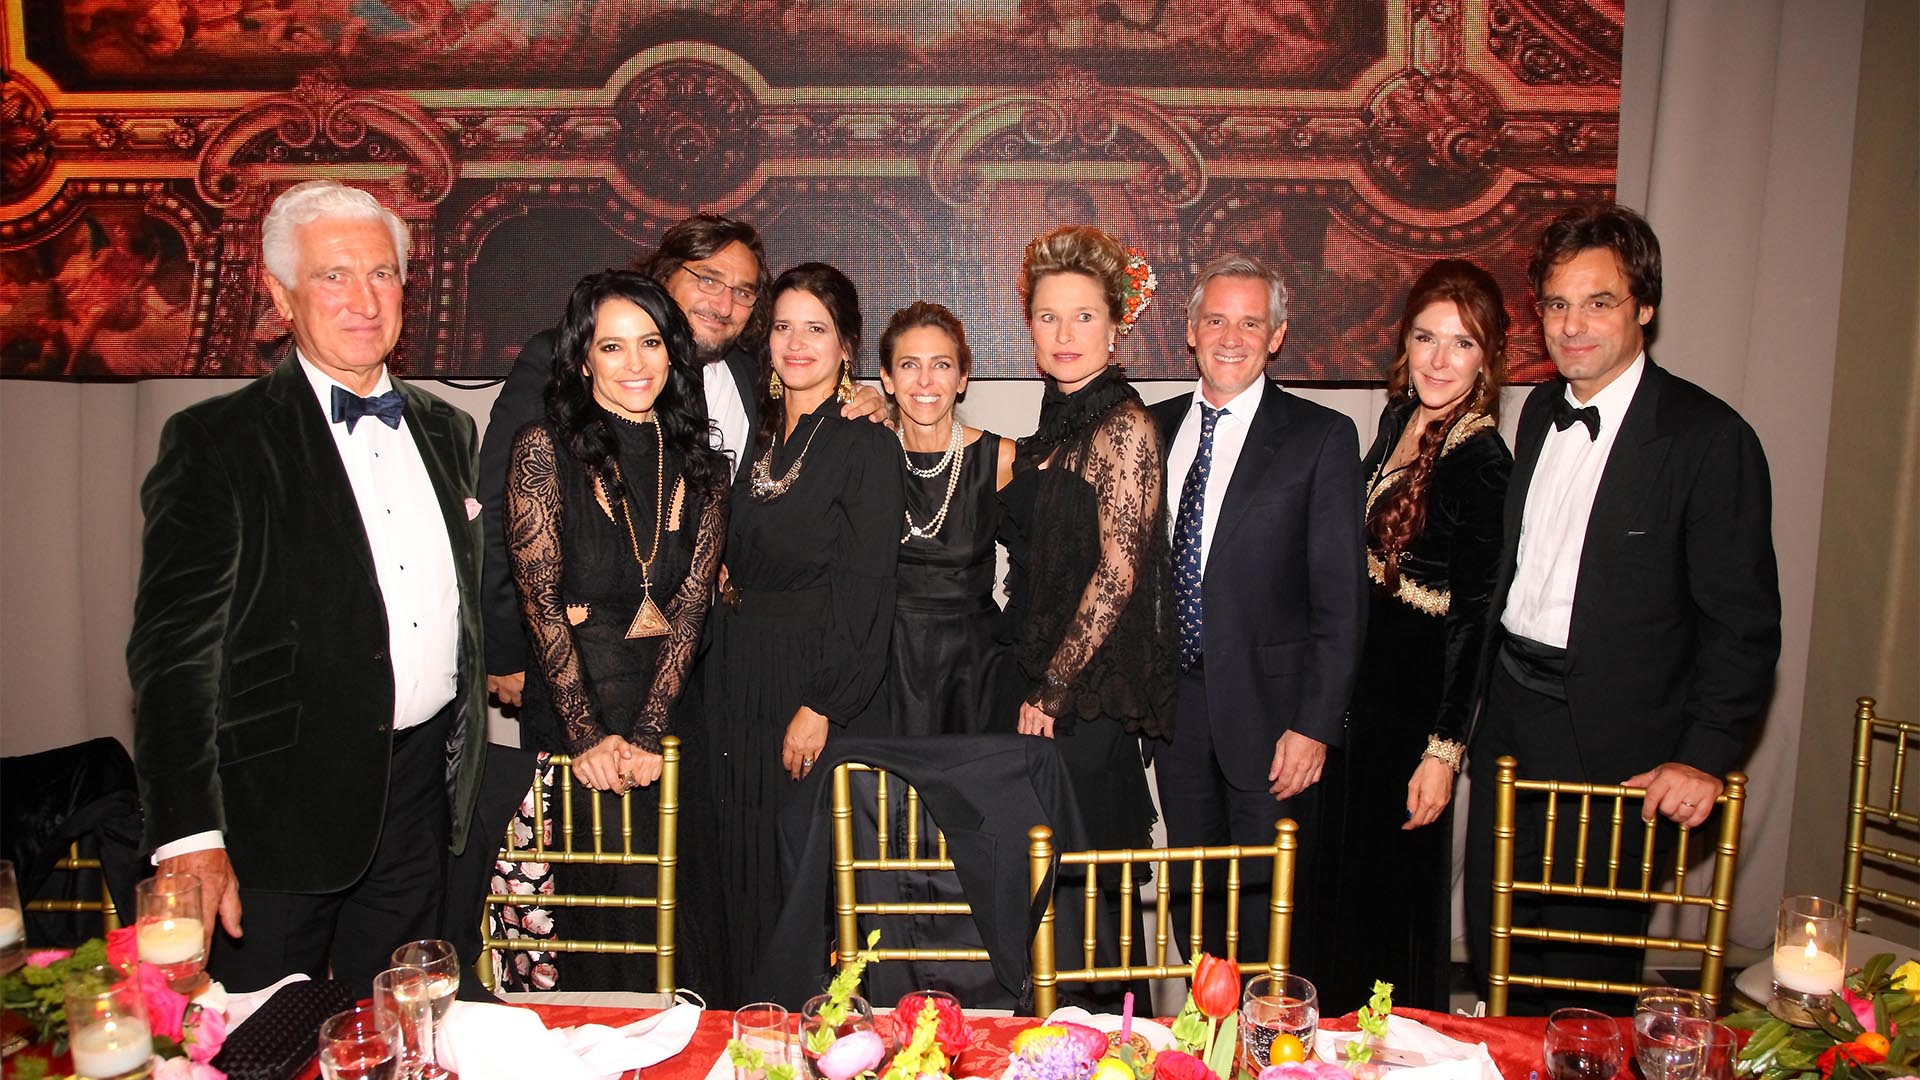 Alex Reynal, Cindy Cohen, Martín y Mijel Kweler, Mariana Bagó, Silke Reynal, Juan Pablo Bagó, Pat Vergez y Lodovico Rocca